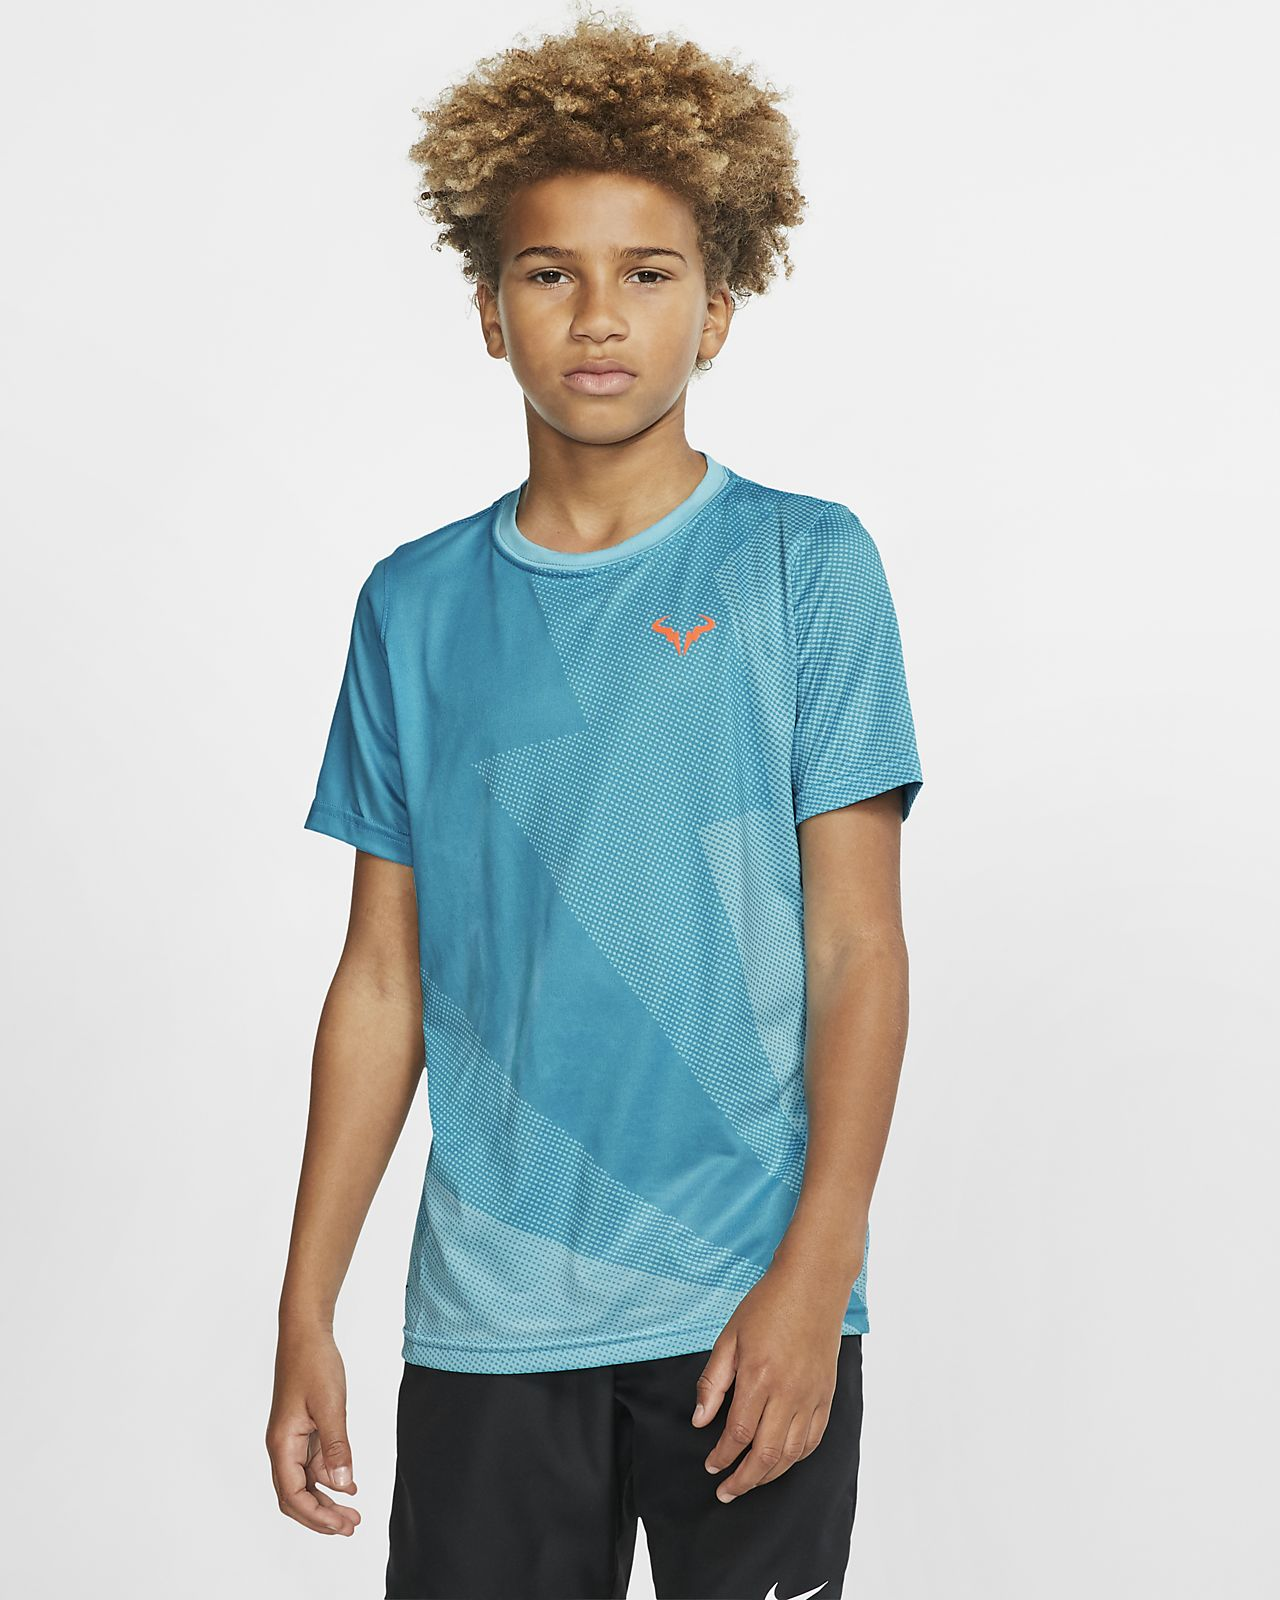 Rafa-Tennis-T-shirt til store børn (drenge)